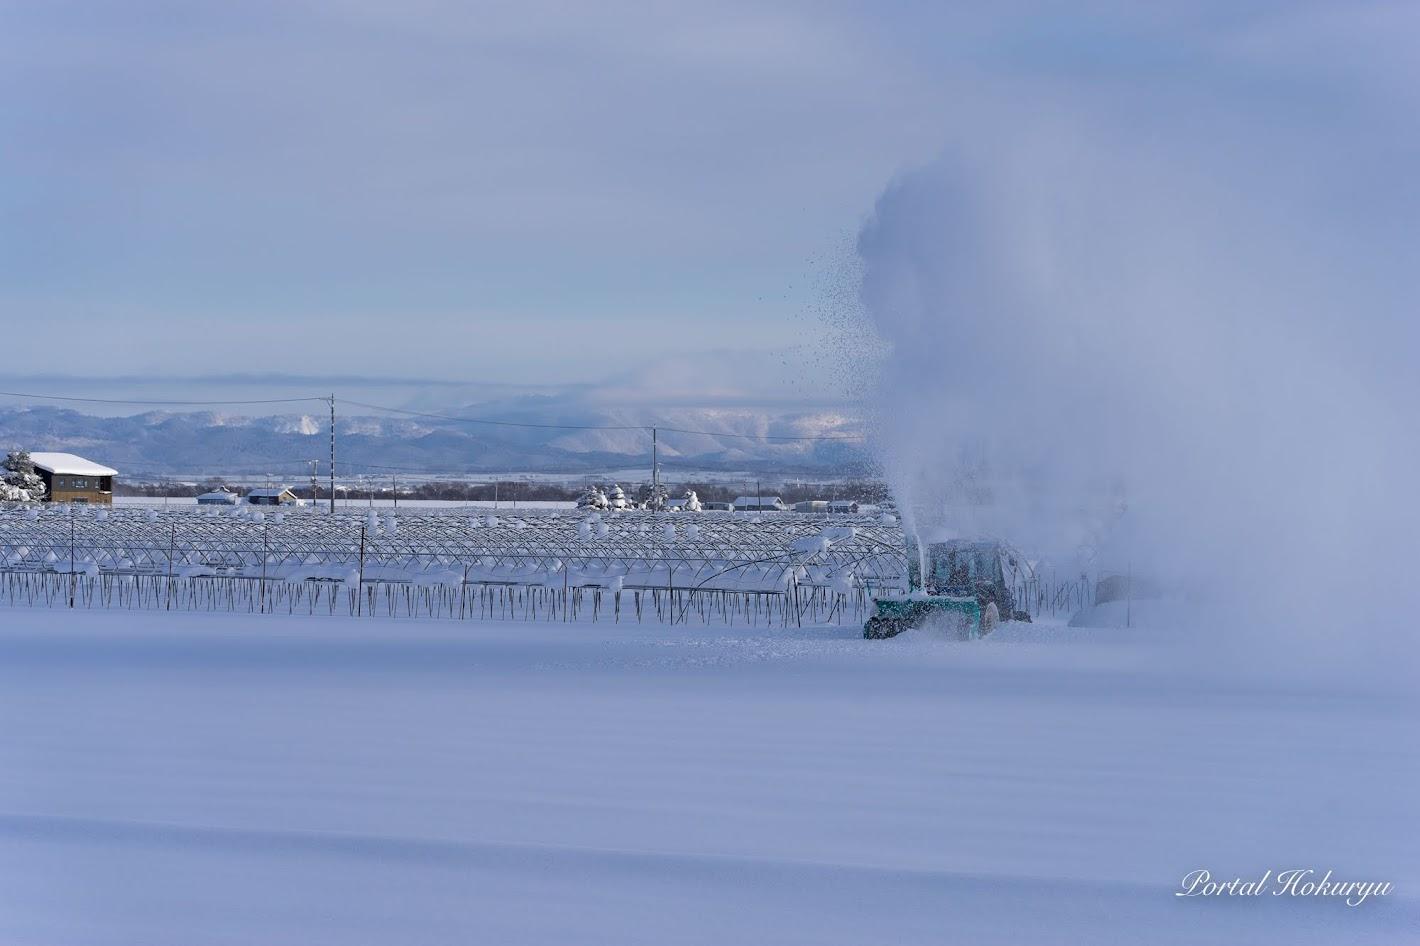 噴雪舞う風景